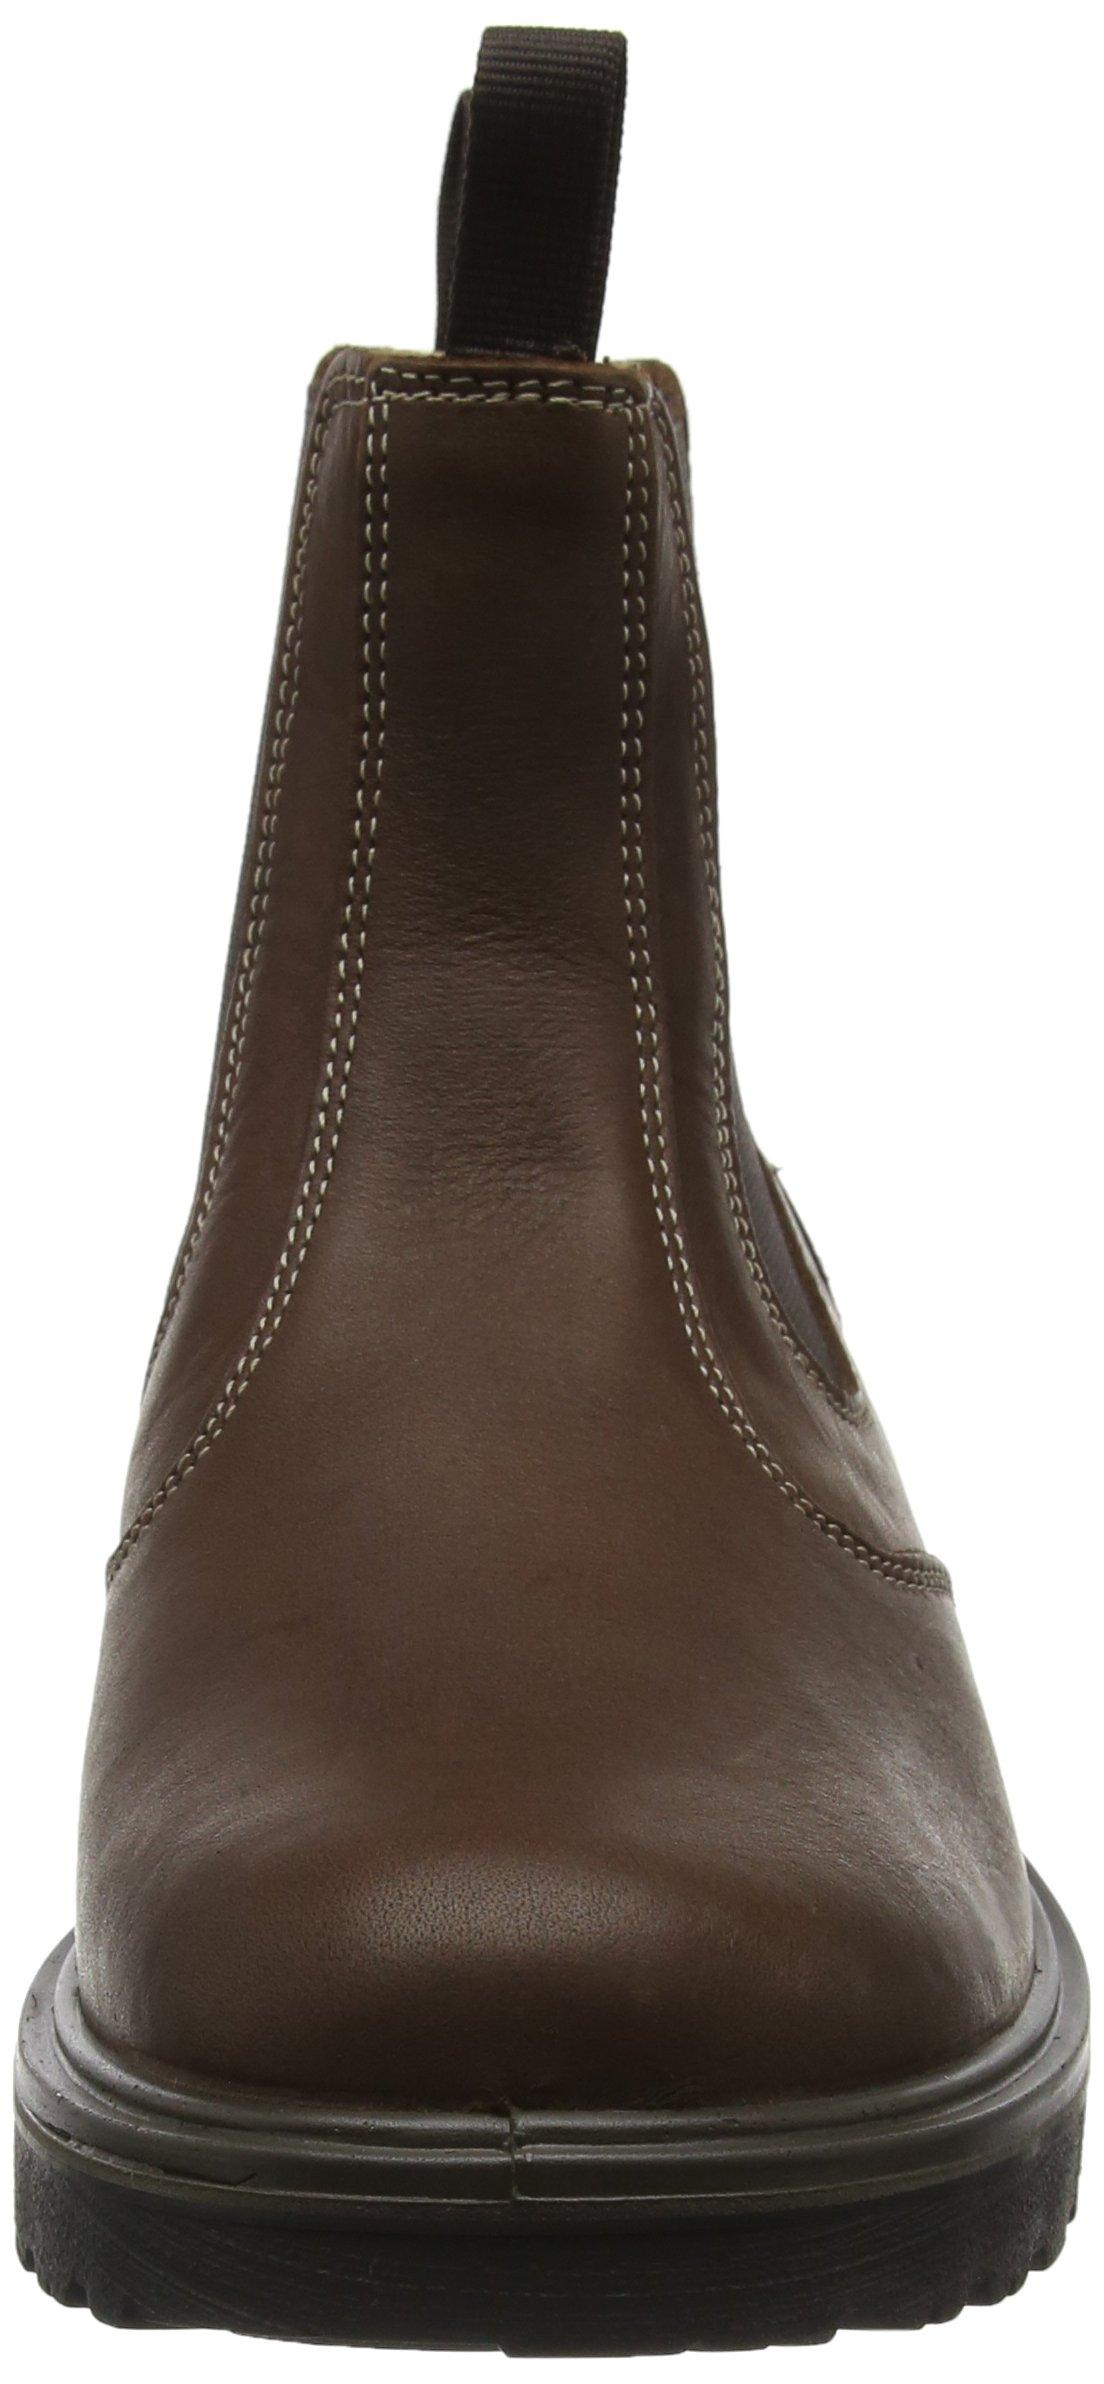 Grisport Men's Crieff High Rise Chelsea Boots 4